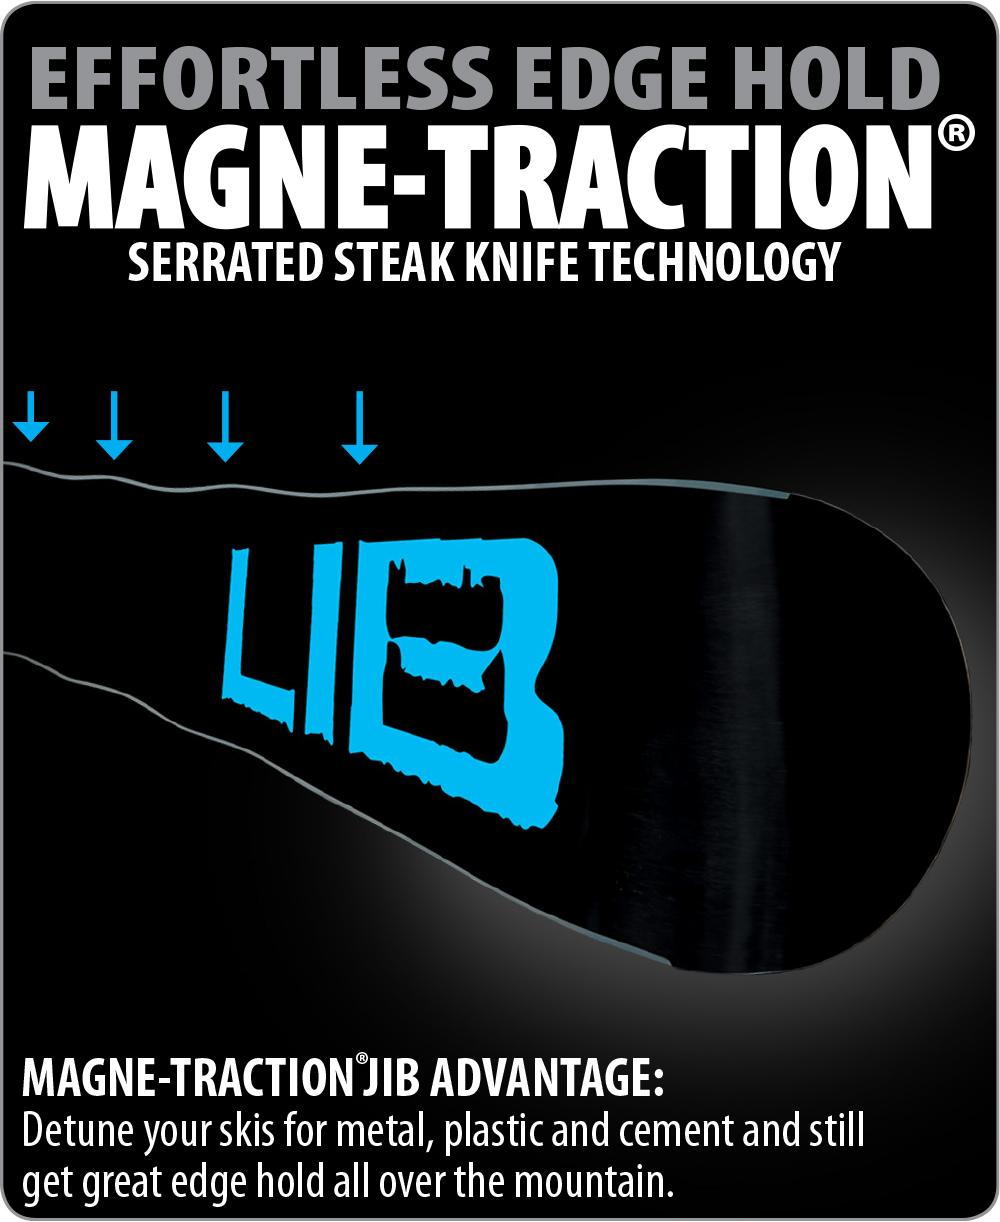 Ski Magne-Traction